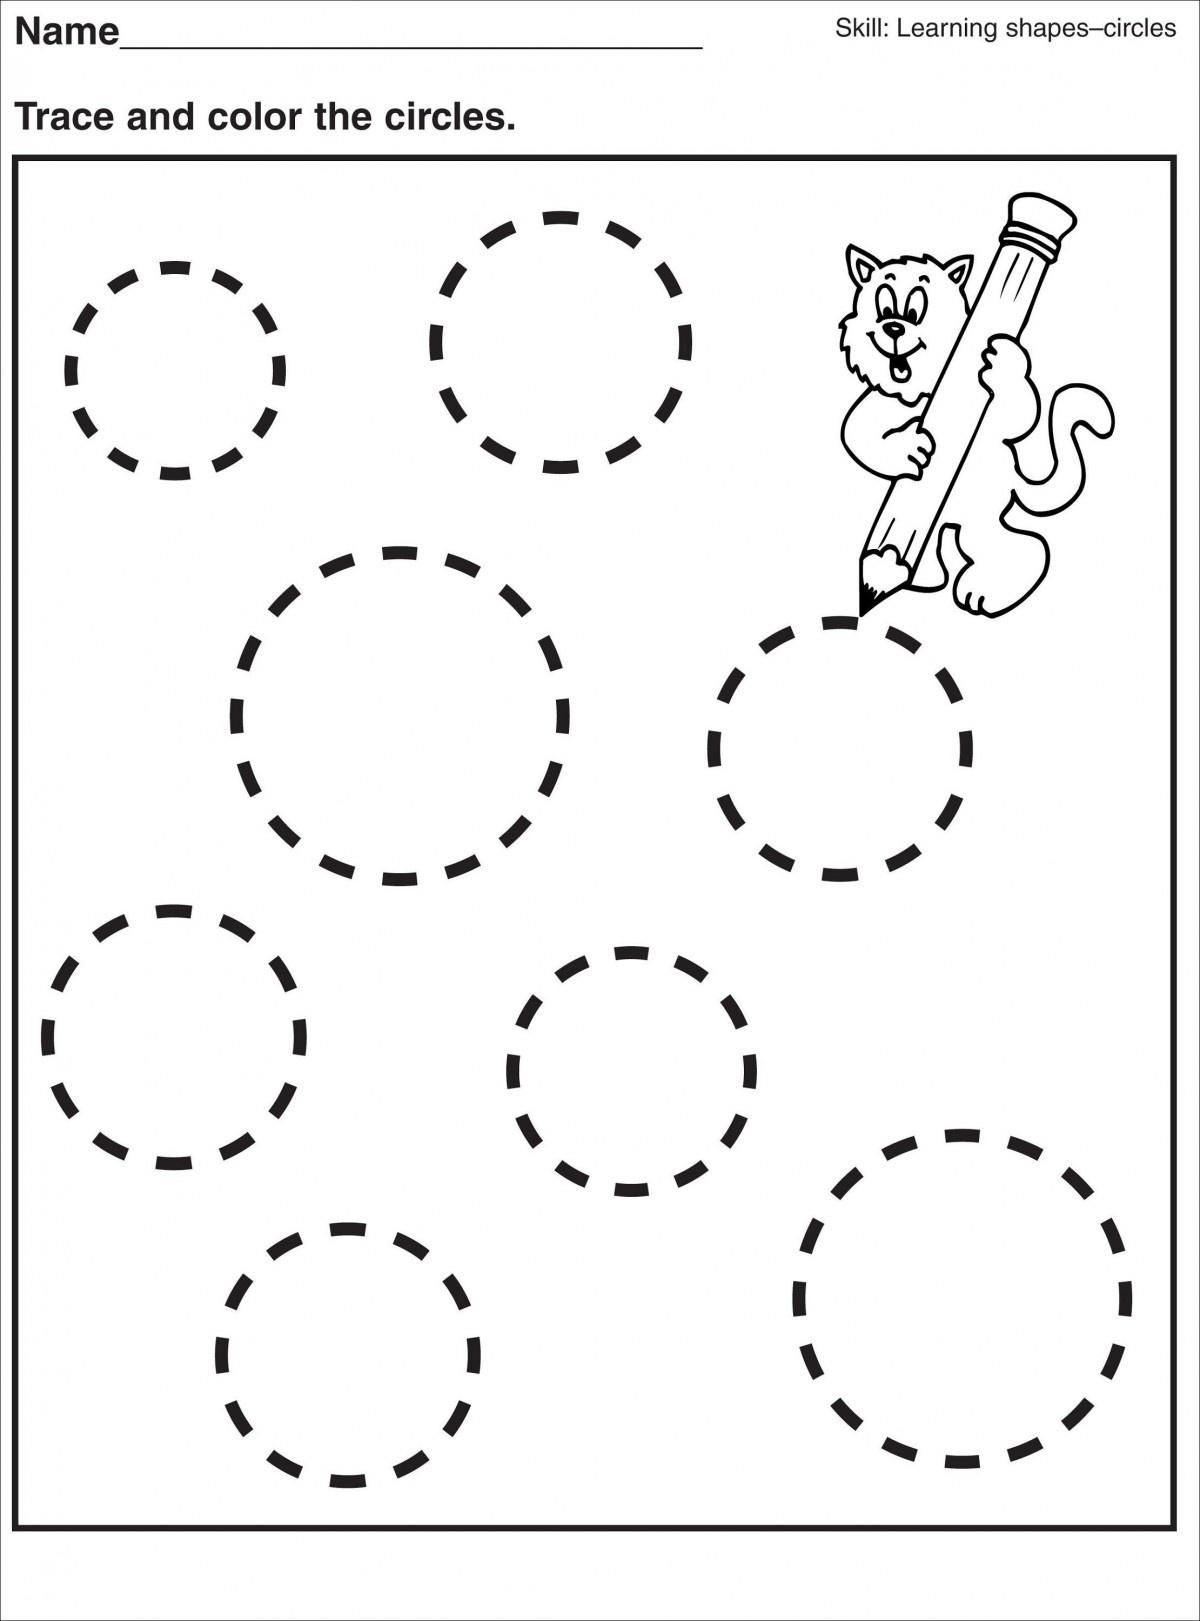 Circle Shape Pattern Worksheets